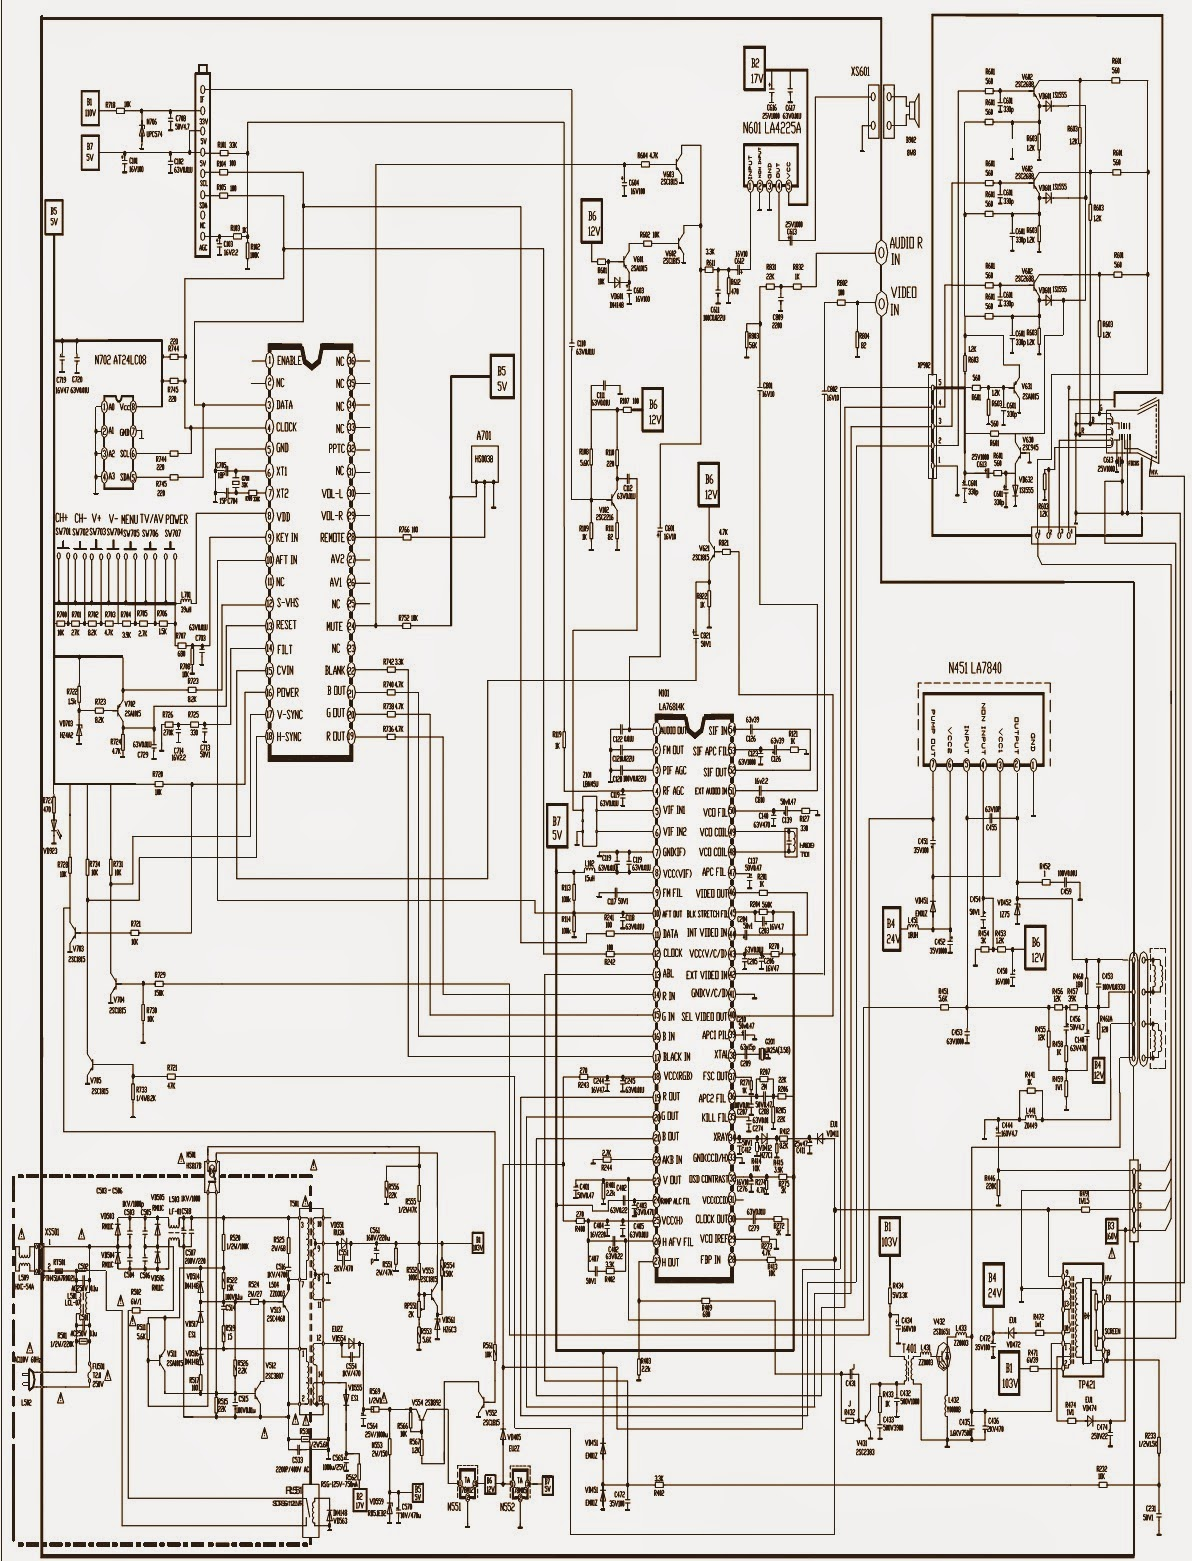 hight resolution of kenworth fuse box diagram 2000 kenworth w900 fuse diagram kenworth w900 fuse box diagram on 2003